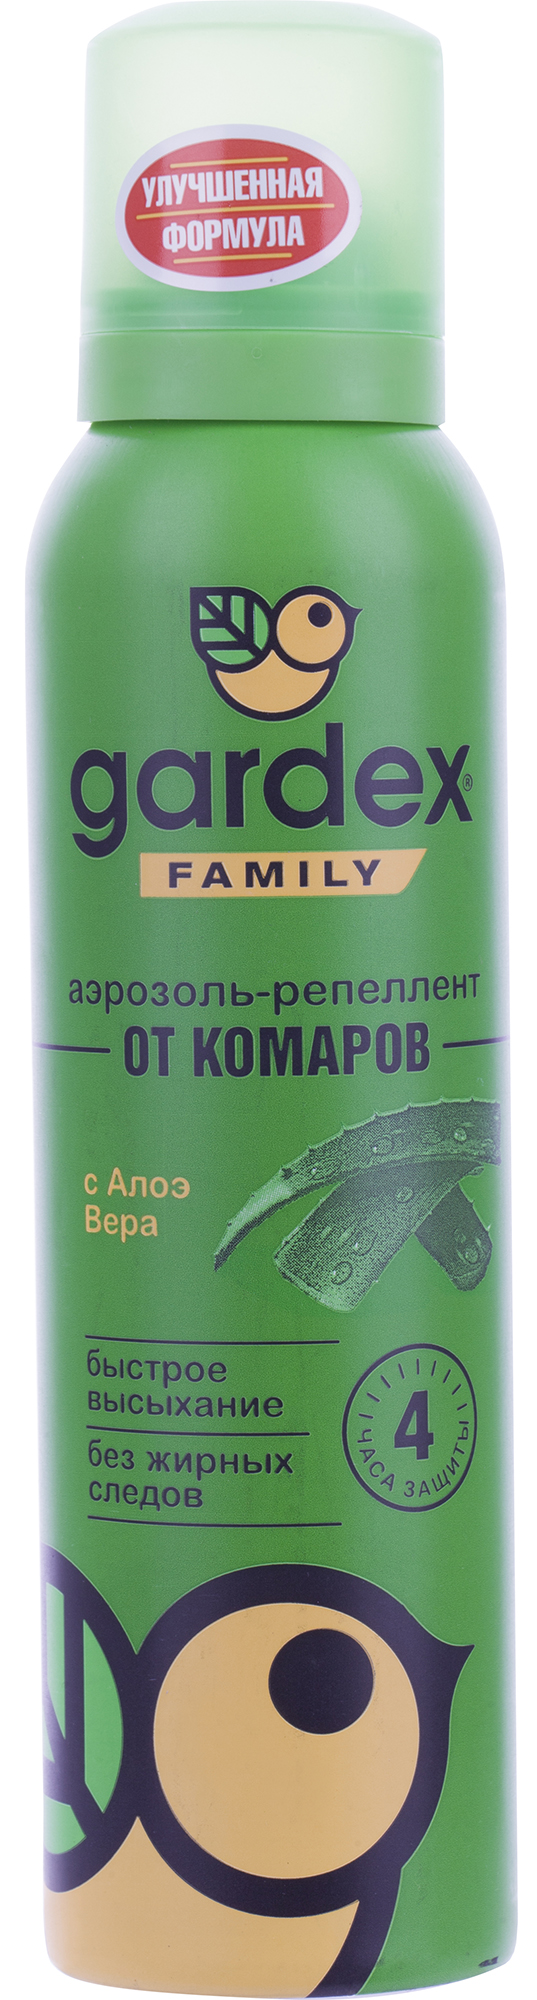 Gardex Аэрозоль-репеллент от комаров Family, 150 мл